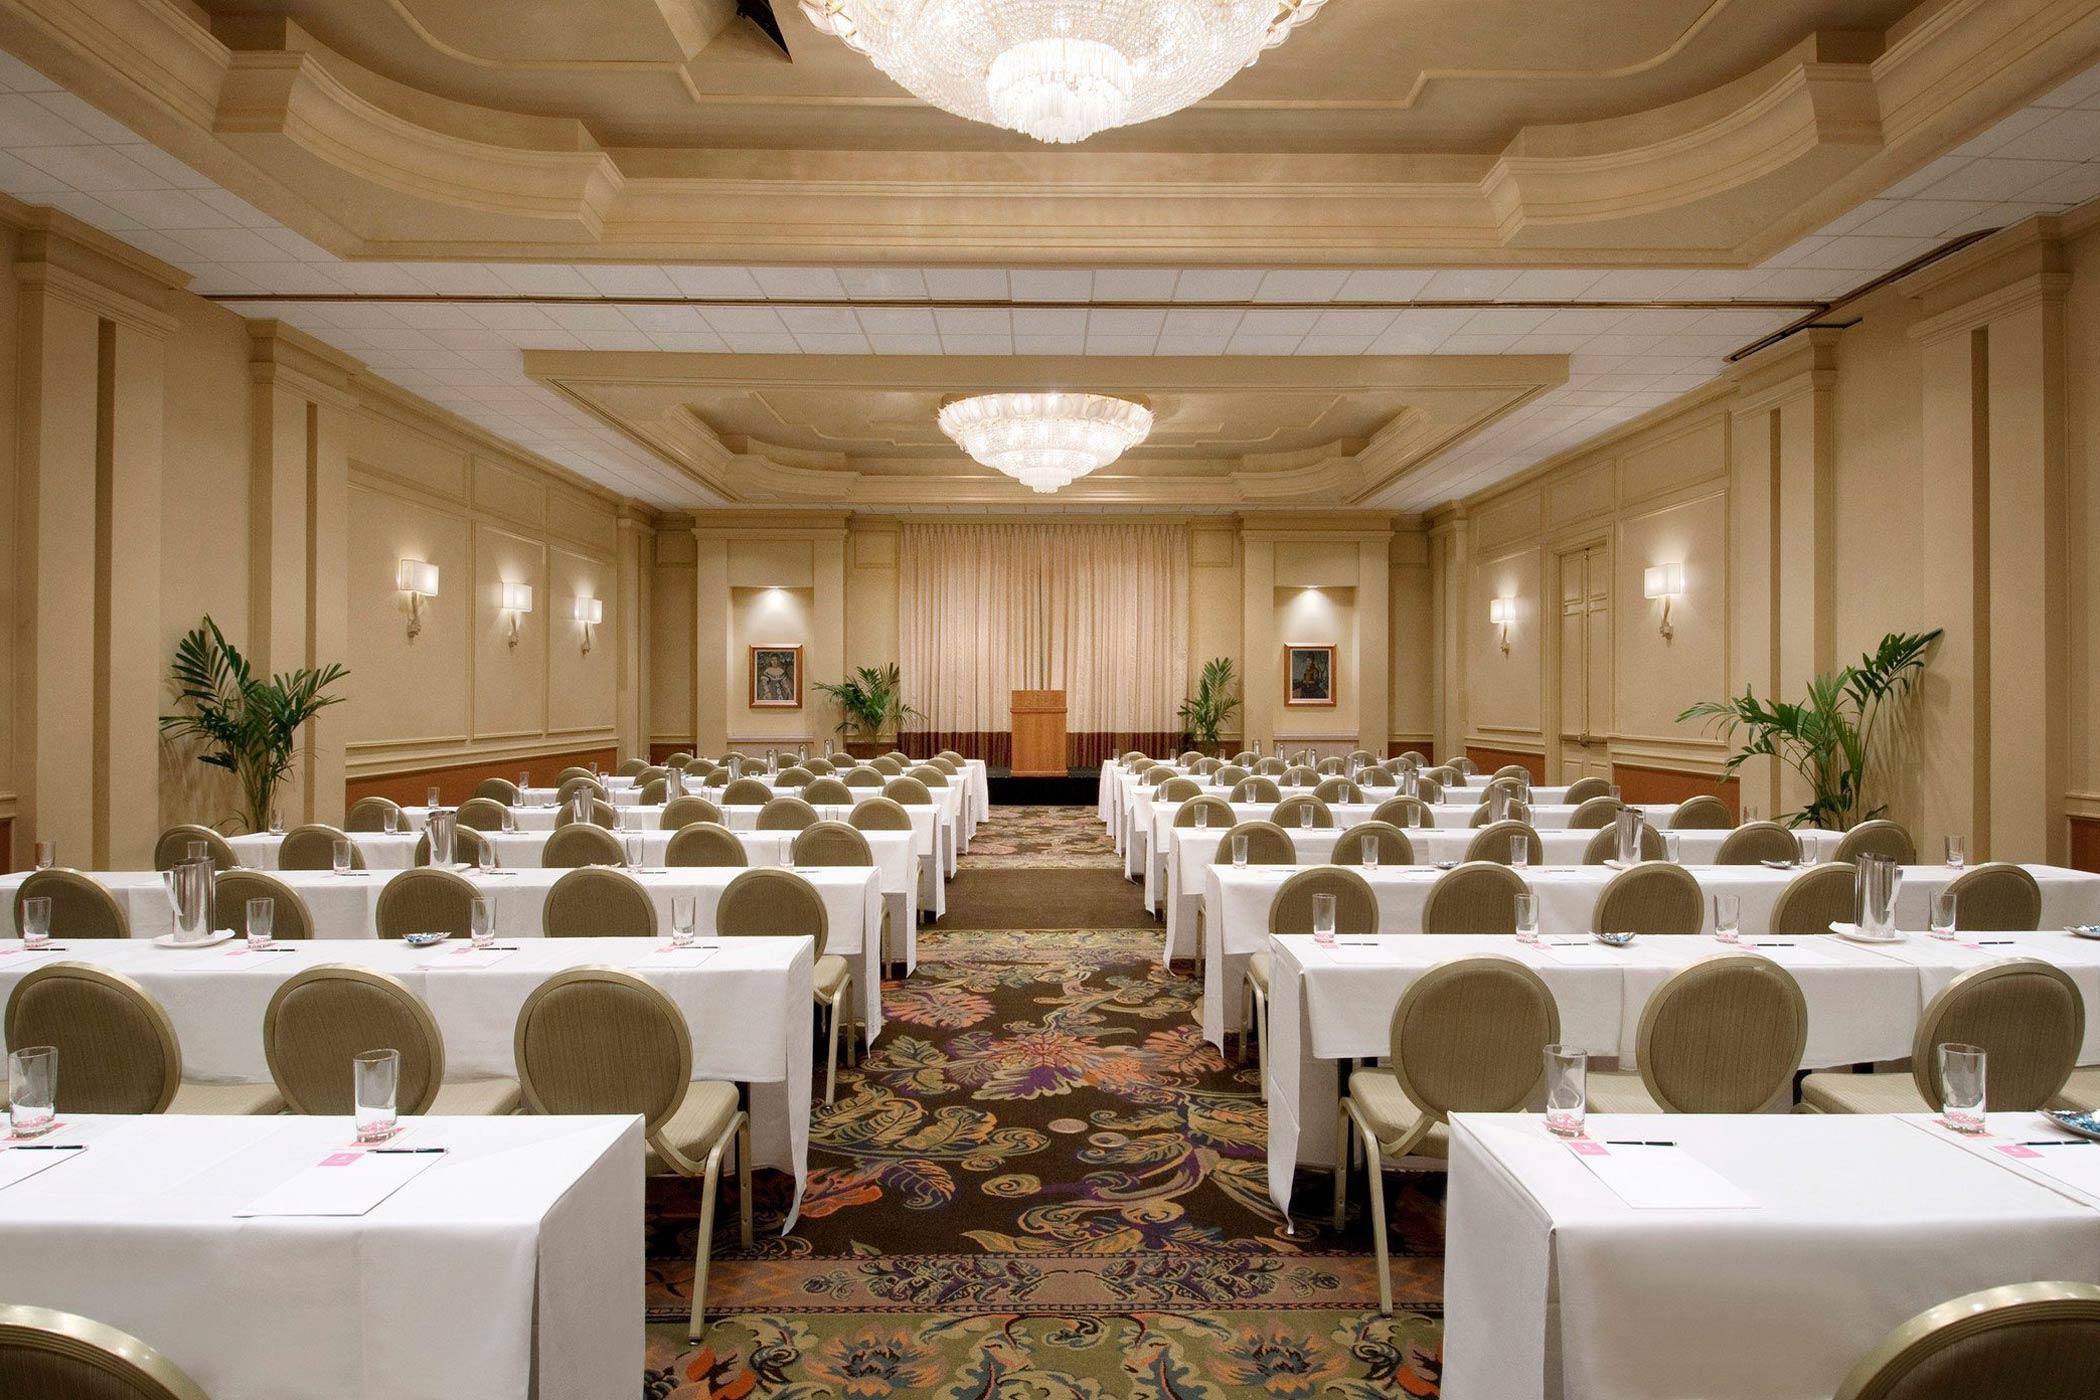 lux376mf-132152-royal-hawaiian-hotel-meetings-Regency-Room-Med-2